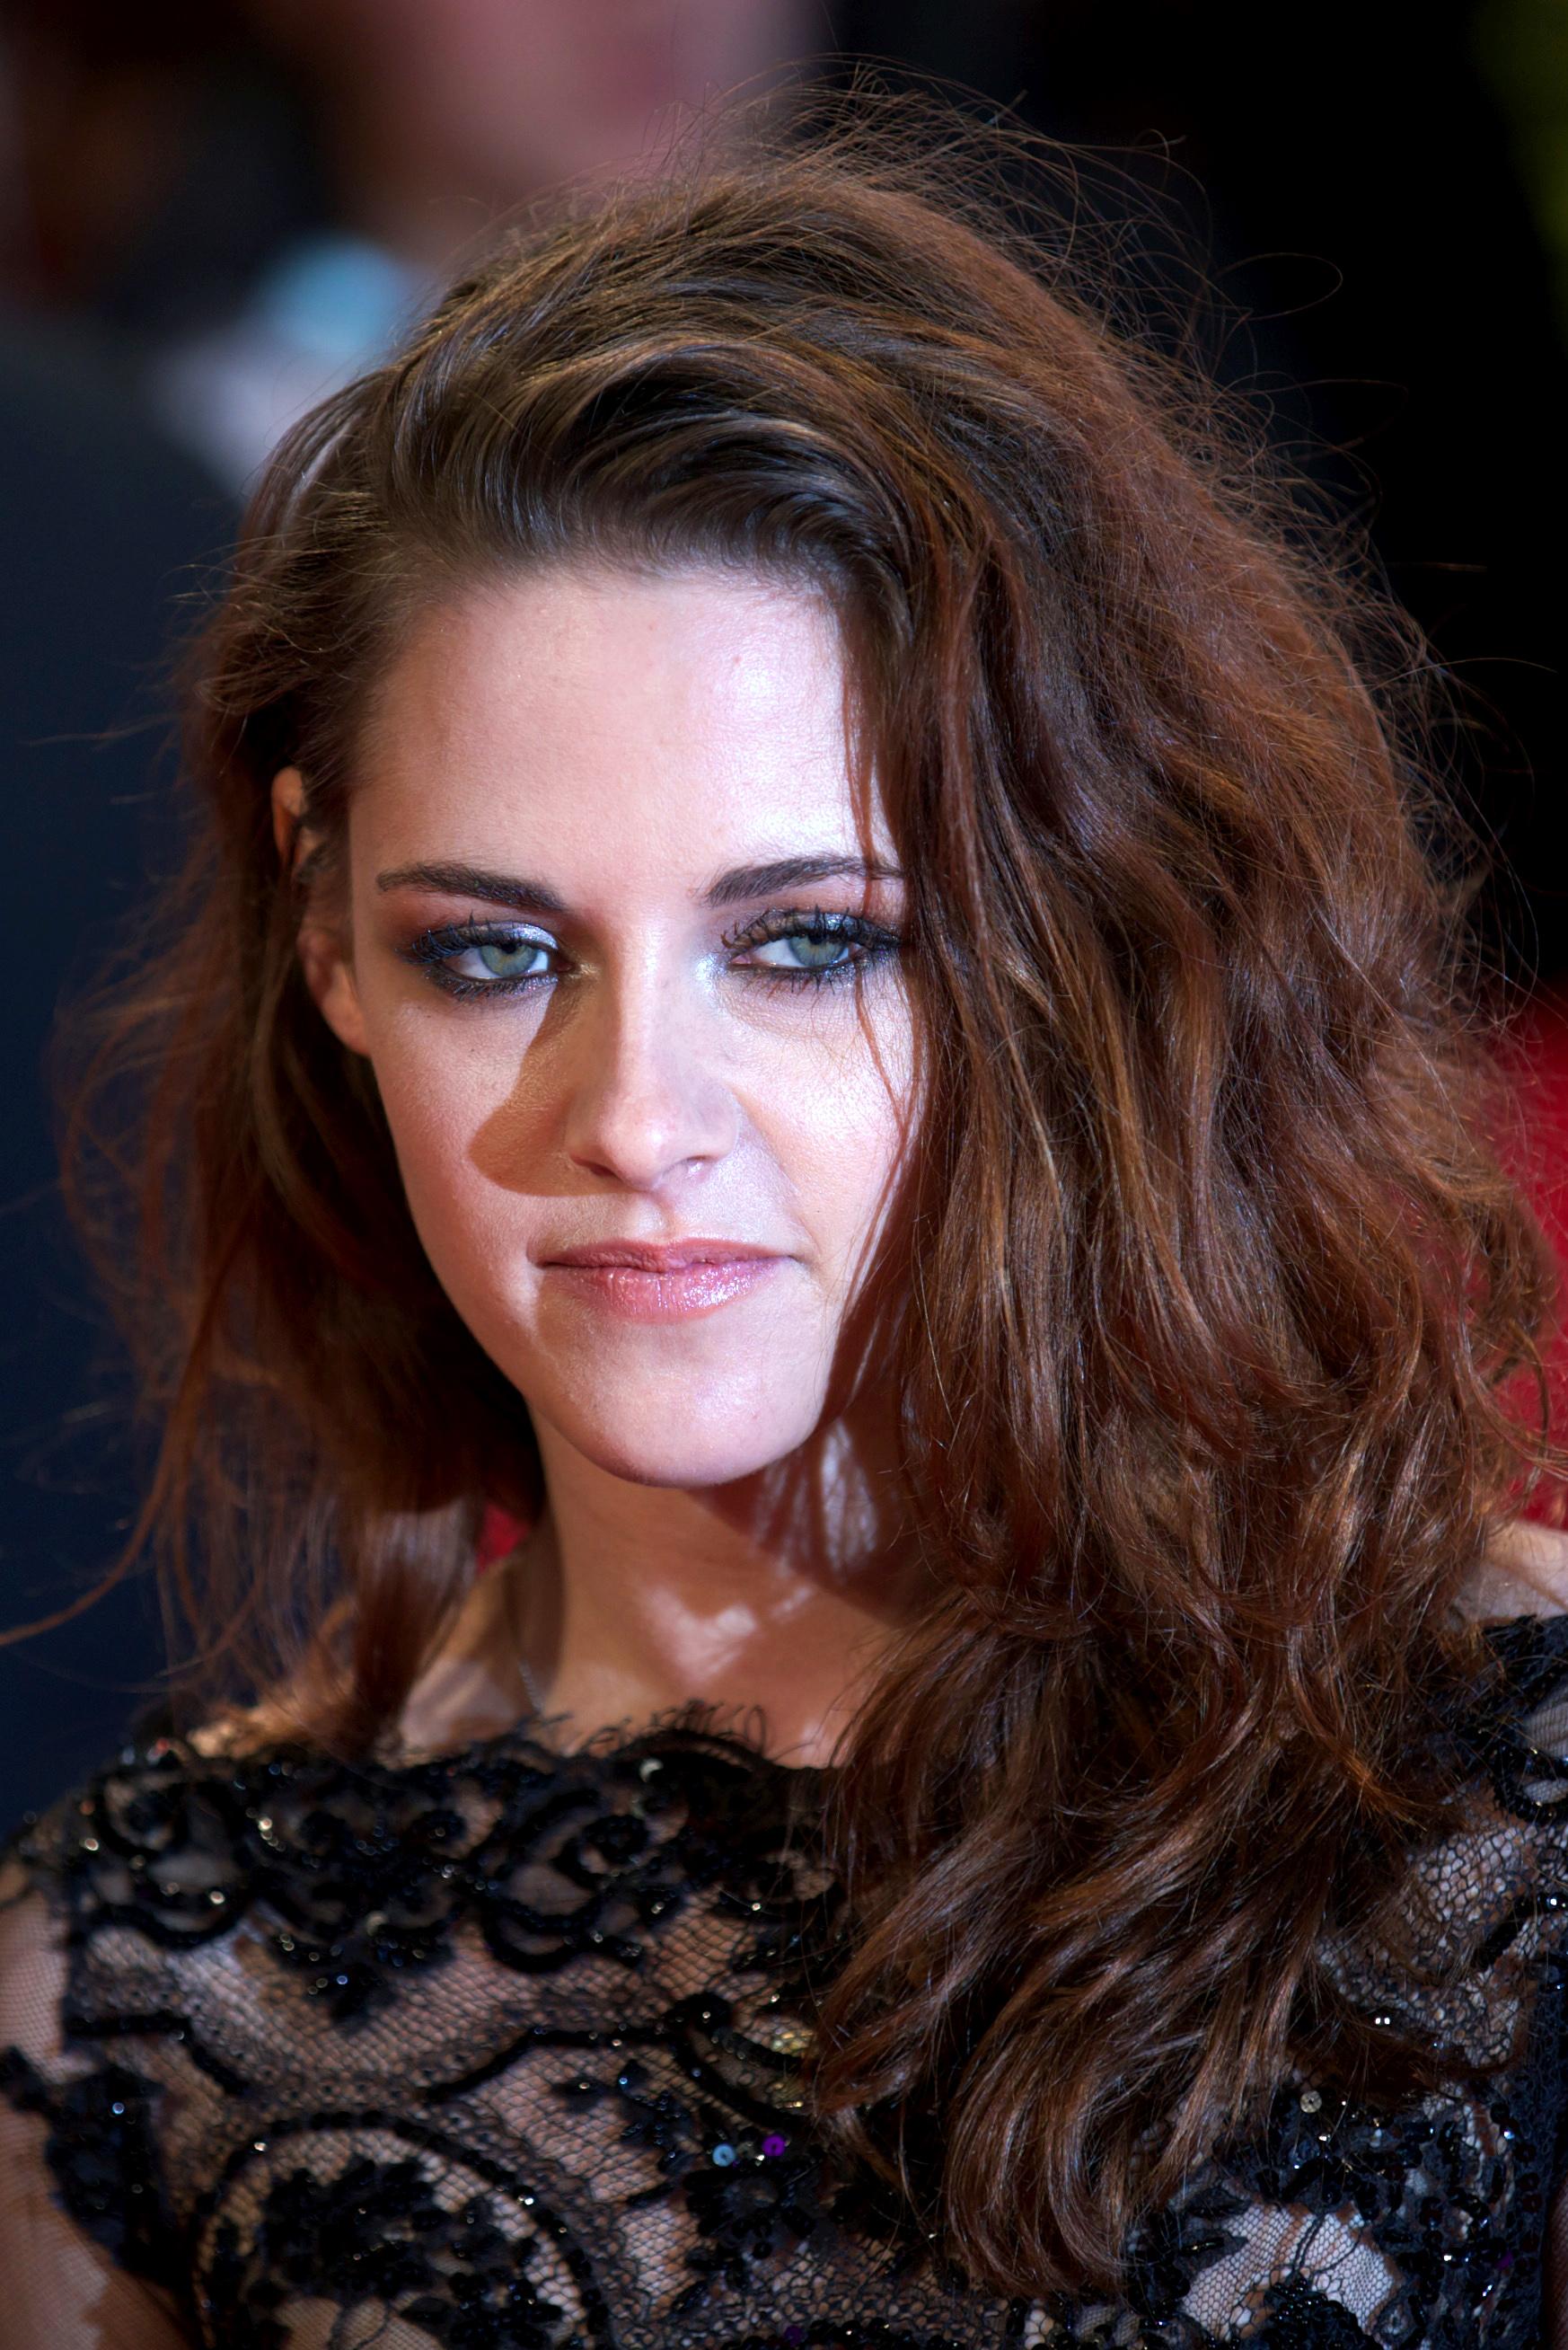 'Twilight' short films to debut on Facebook